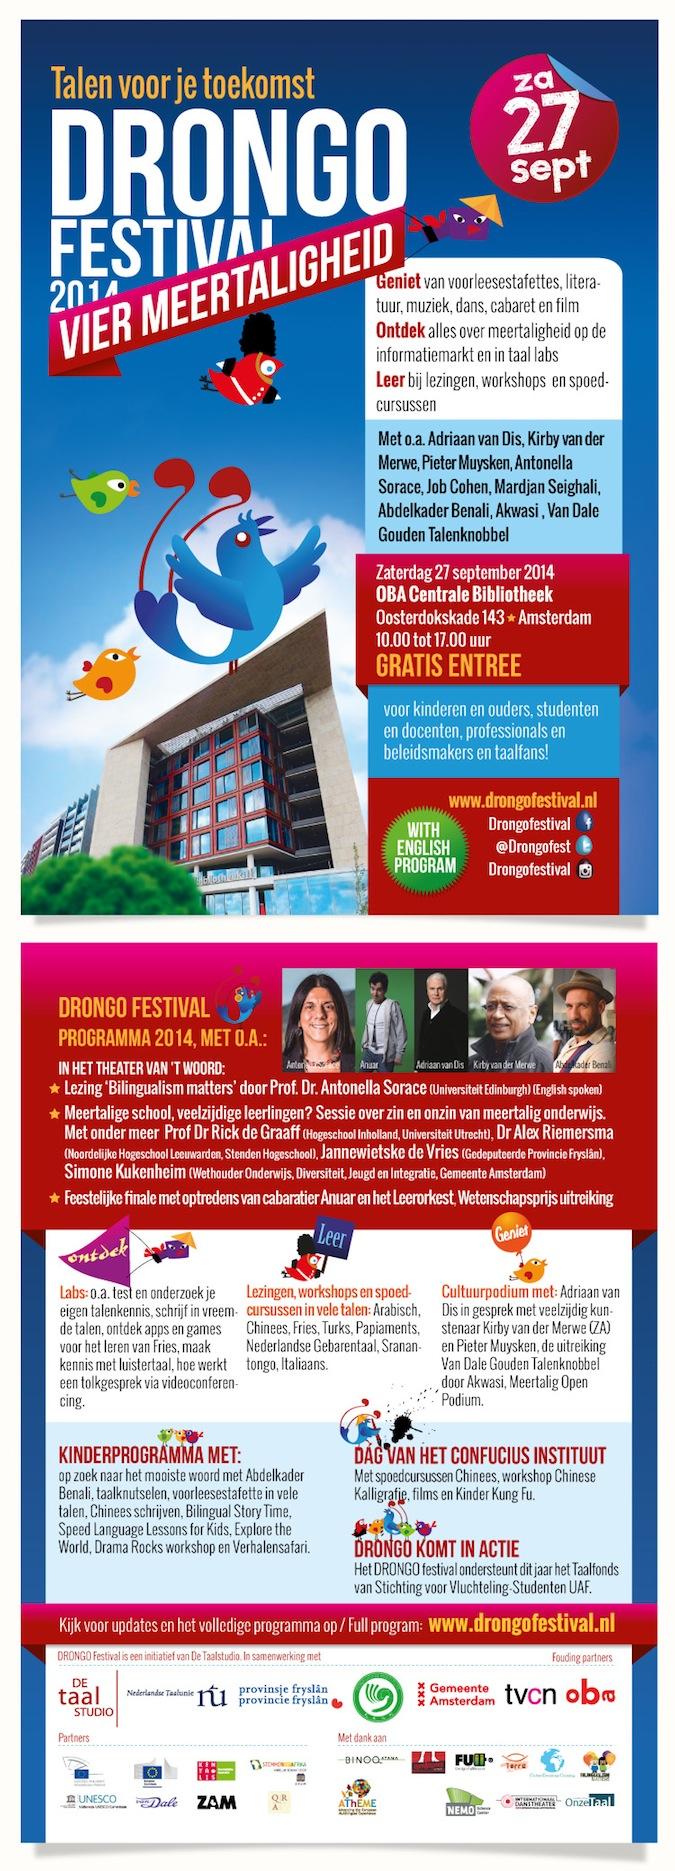 Drongo_festival_2014_Flyer